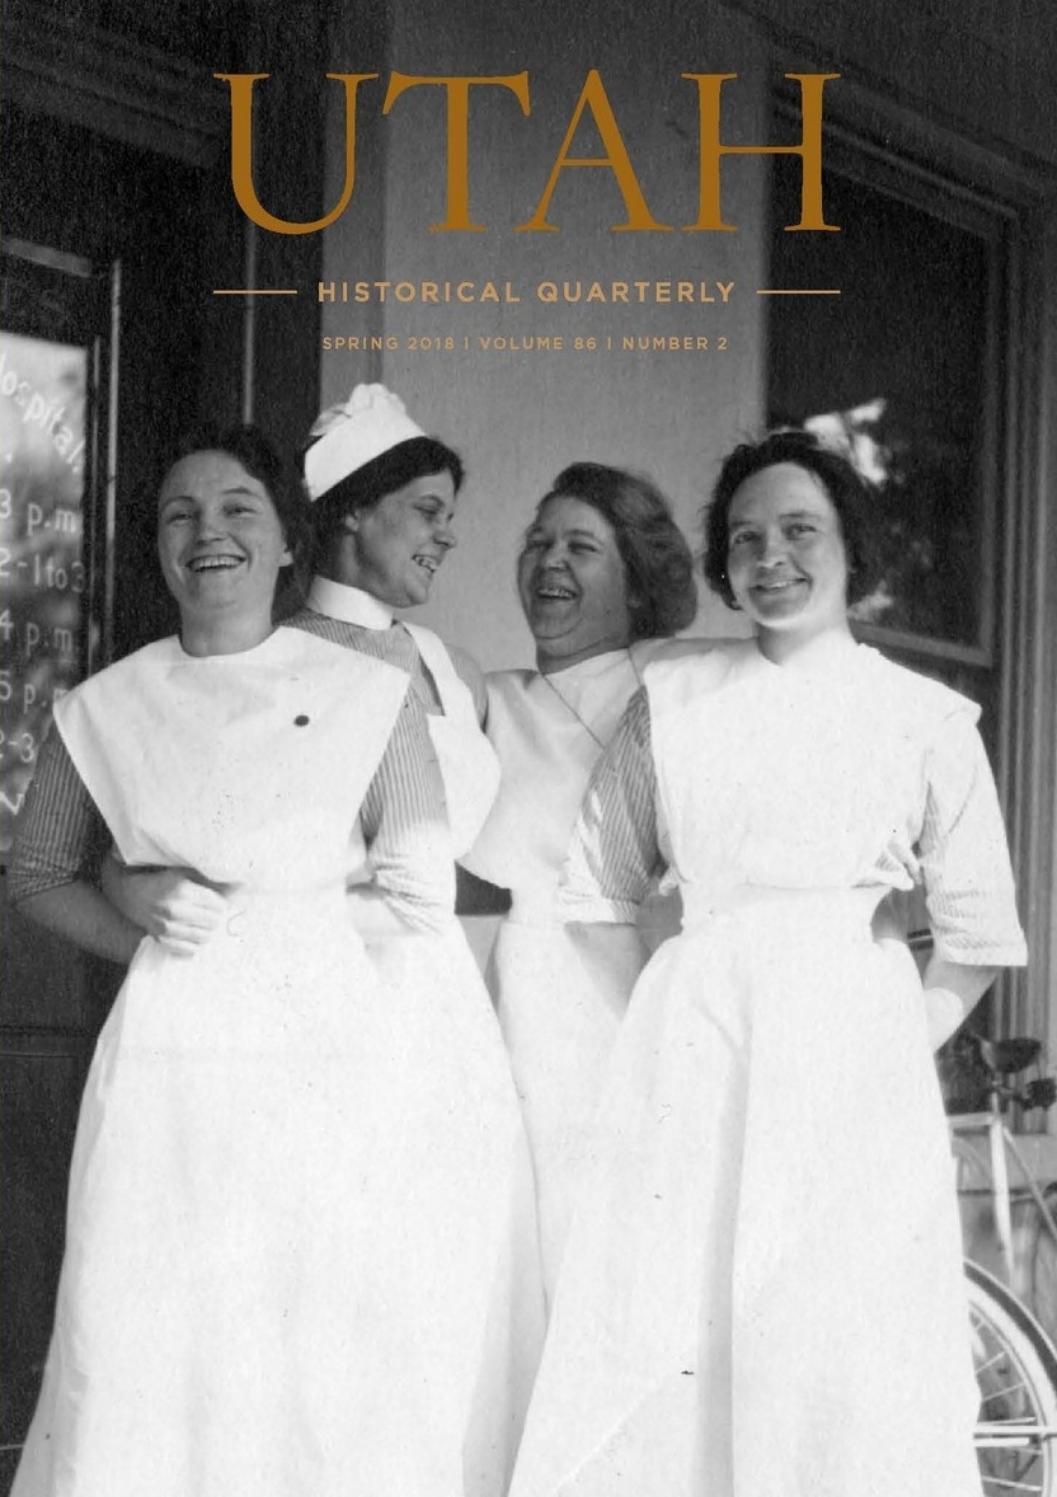 Utah Historical Quarterly, Volume 86, Number 2, 2018 by Utah